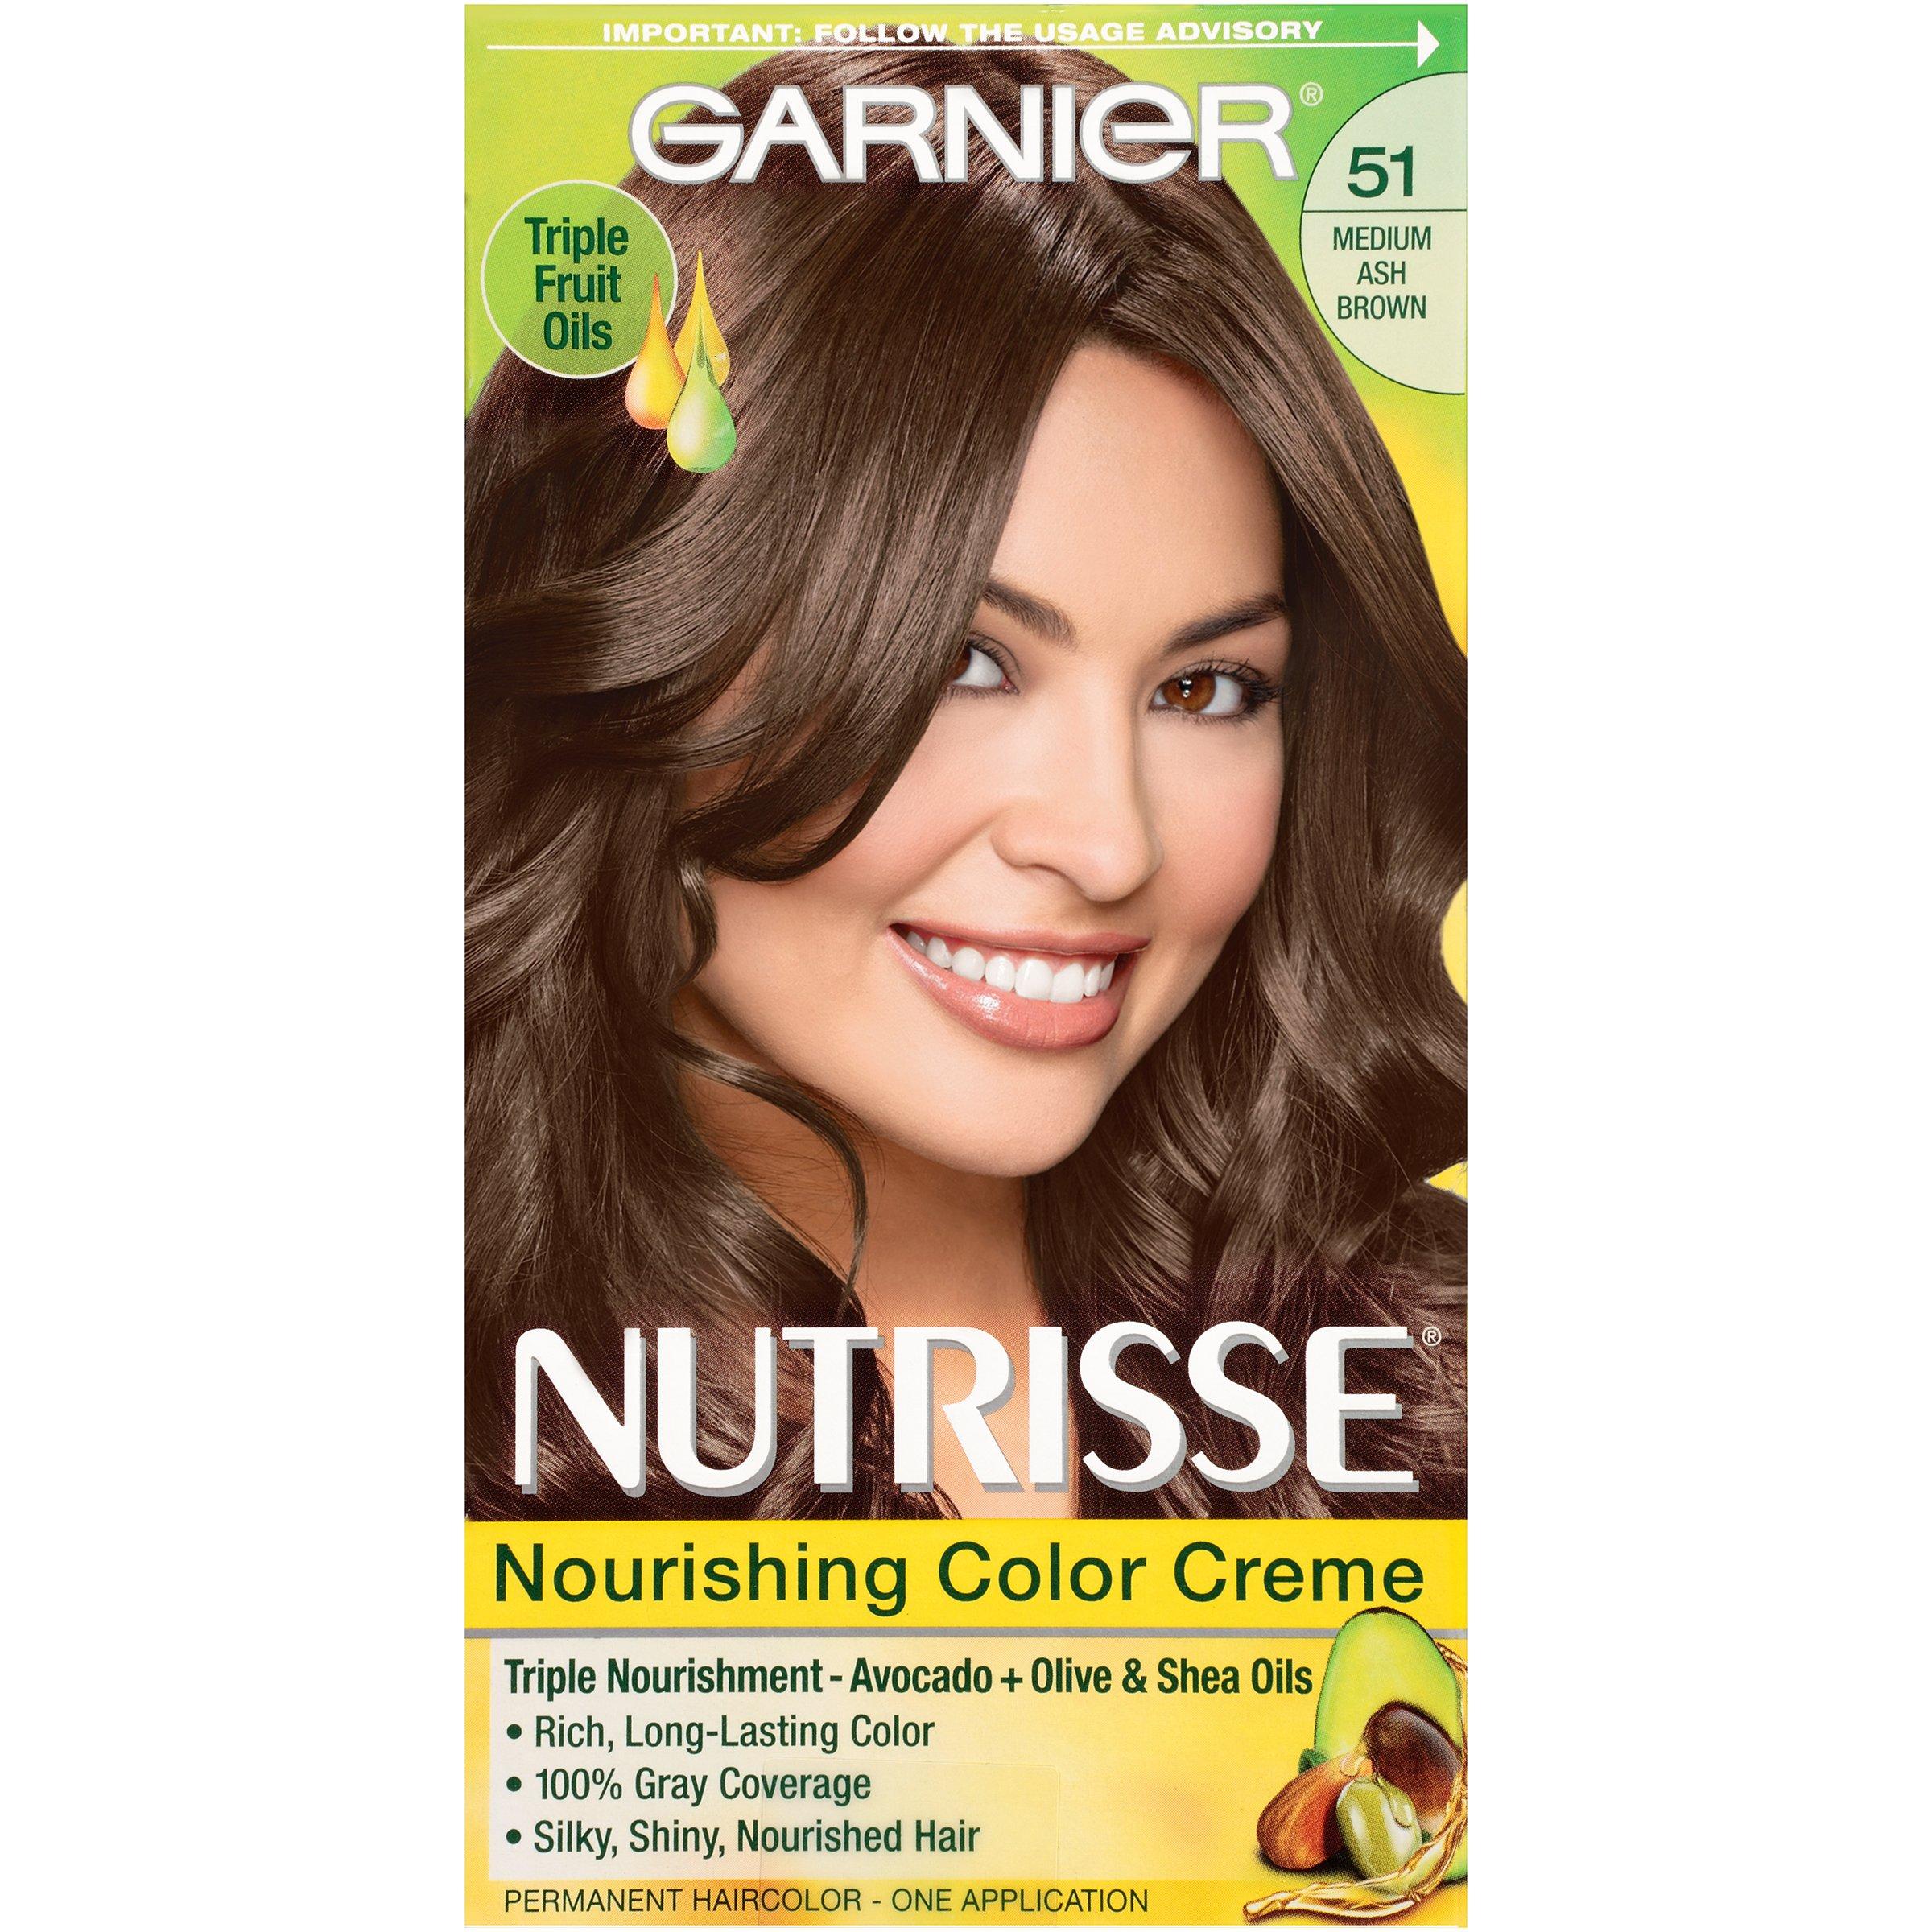 Amazon garnier herbashine haircolor 510 medium ash brown garnier nutrisse nourishing hair color creme 51 medium ash brown cool tea nvjuhfo Image collections